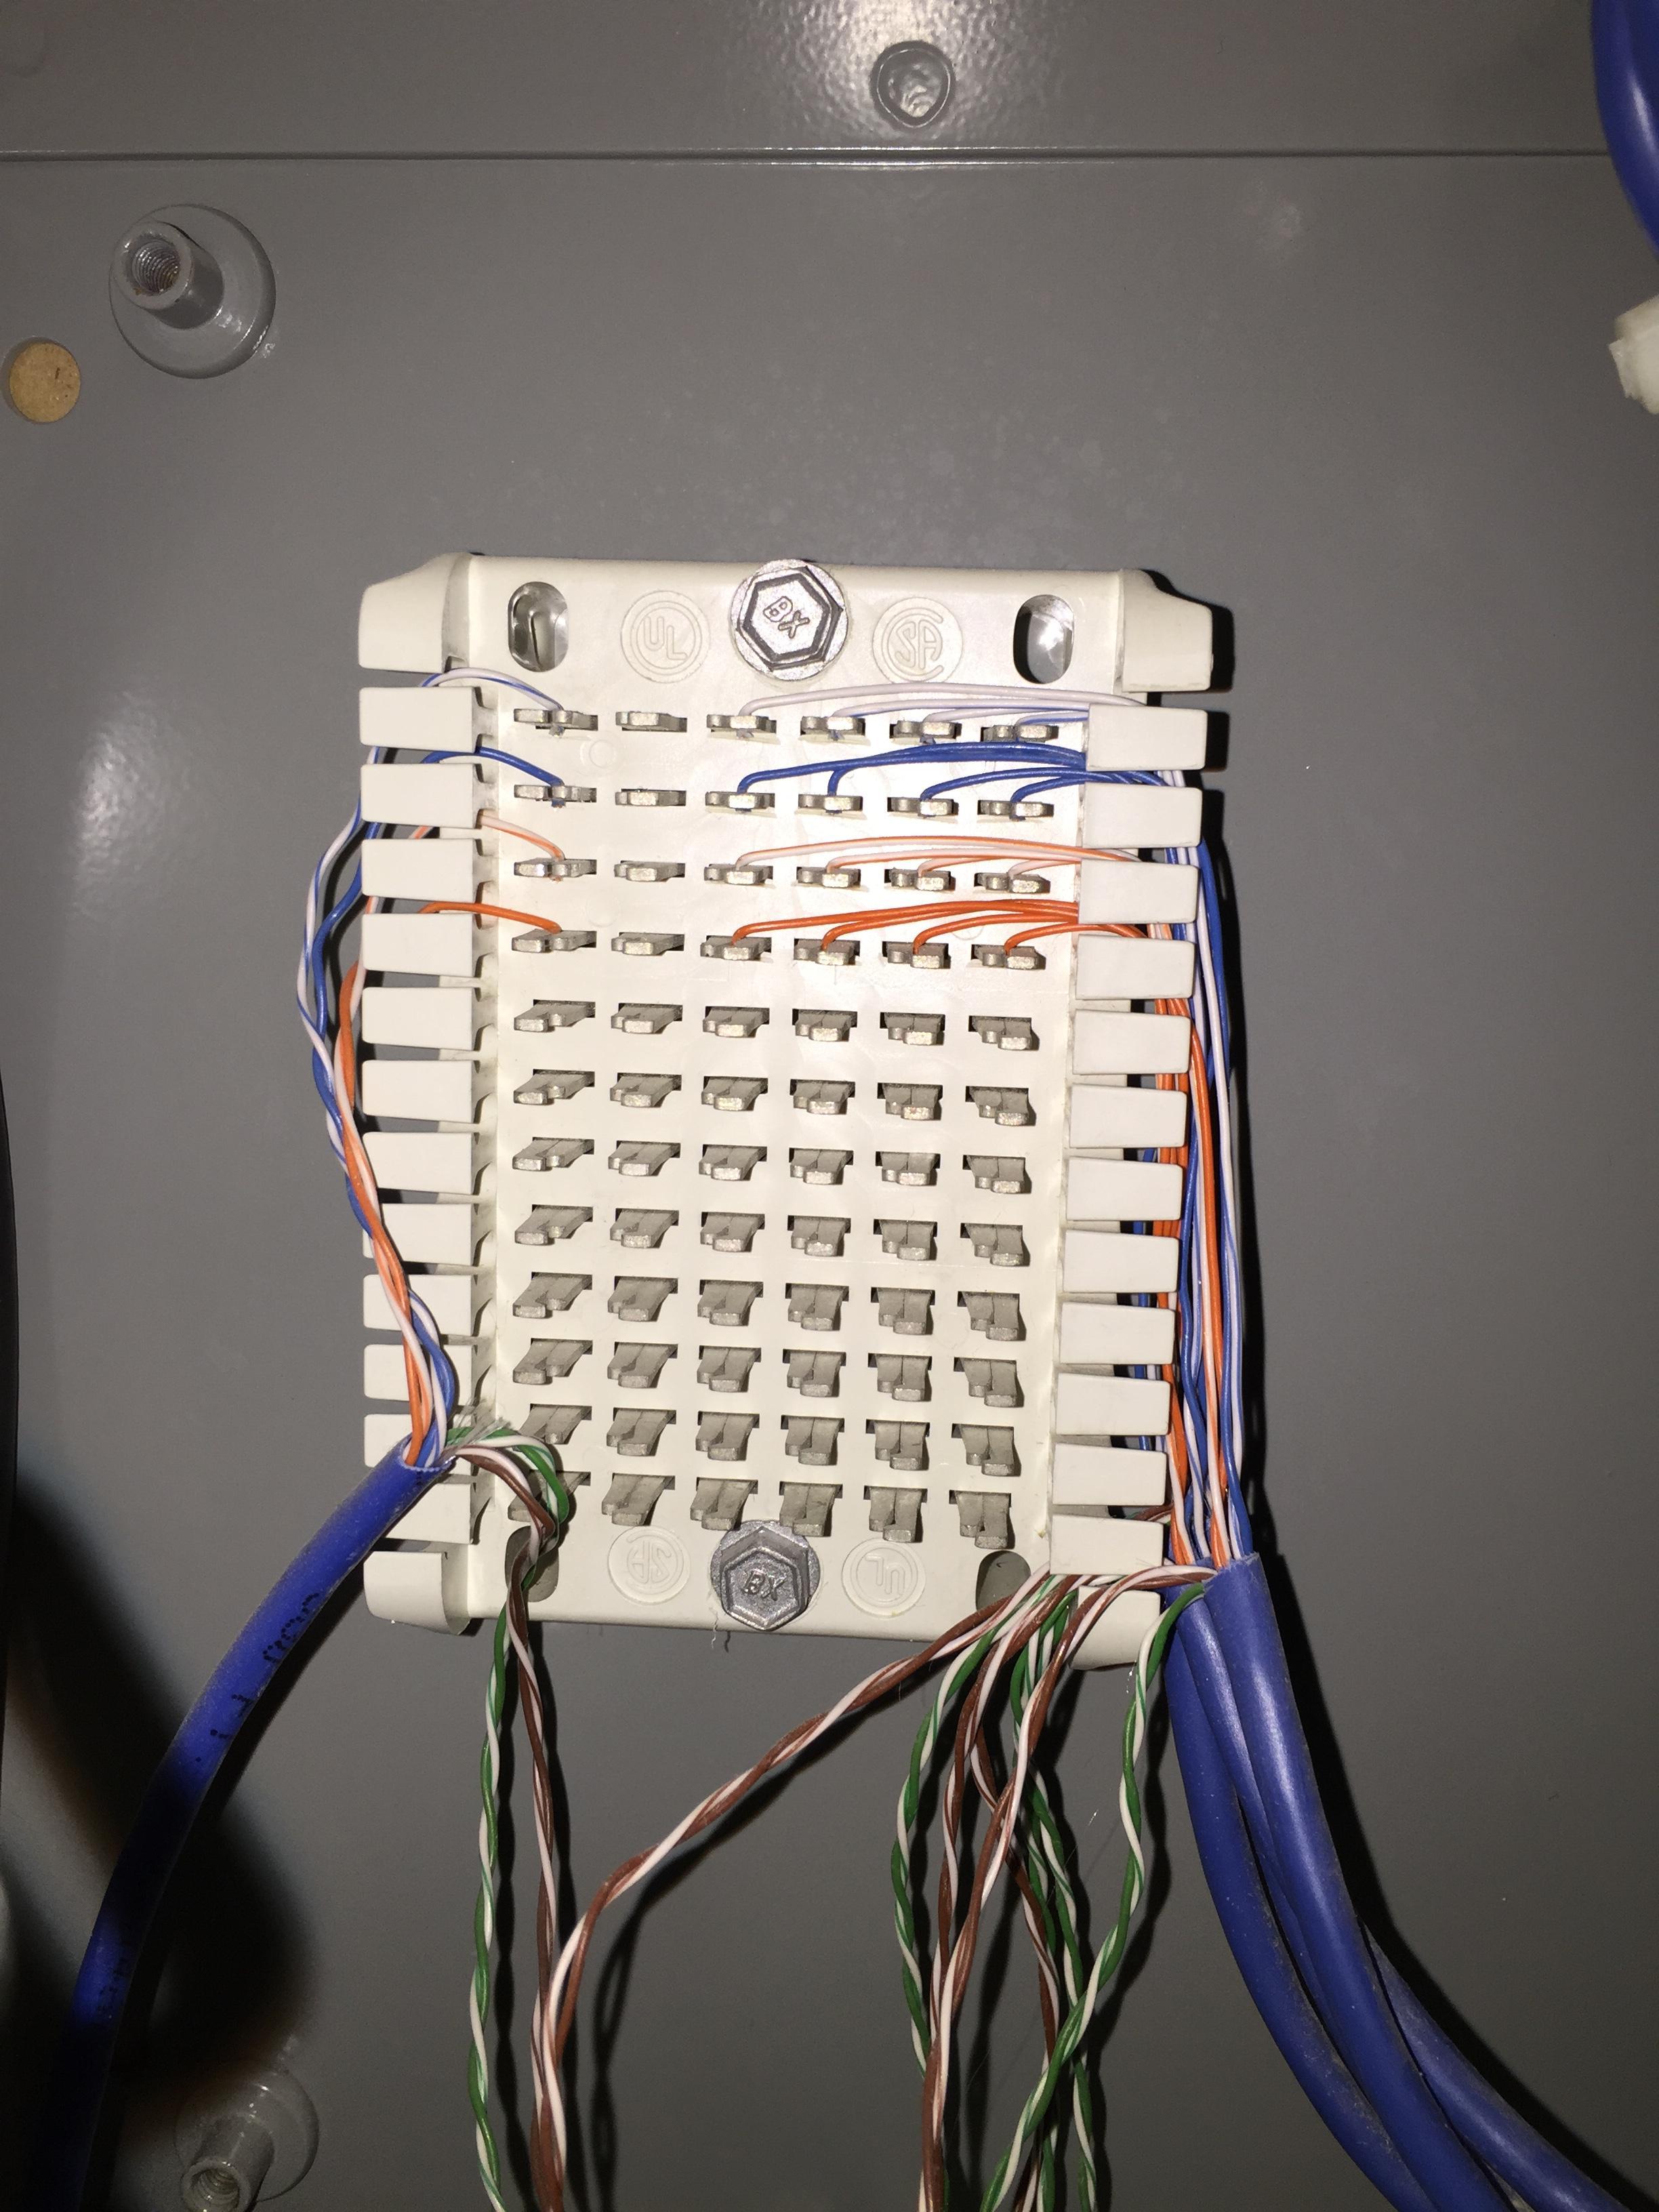 ethernet phone wiring diagram cv 6667  phone panel wiring schematic wiring  cv 6667  phone panel wiring schematic